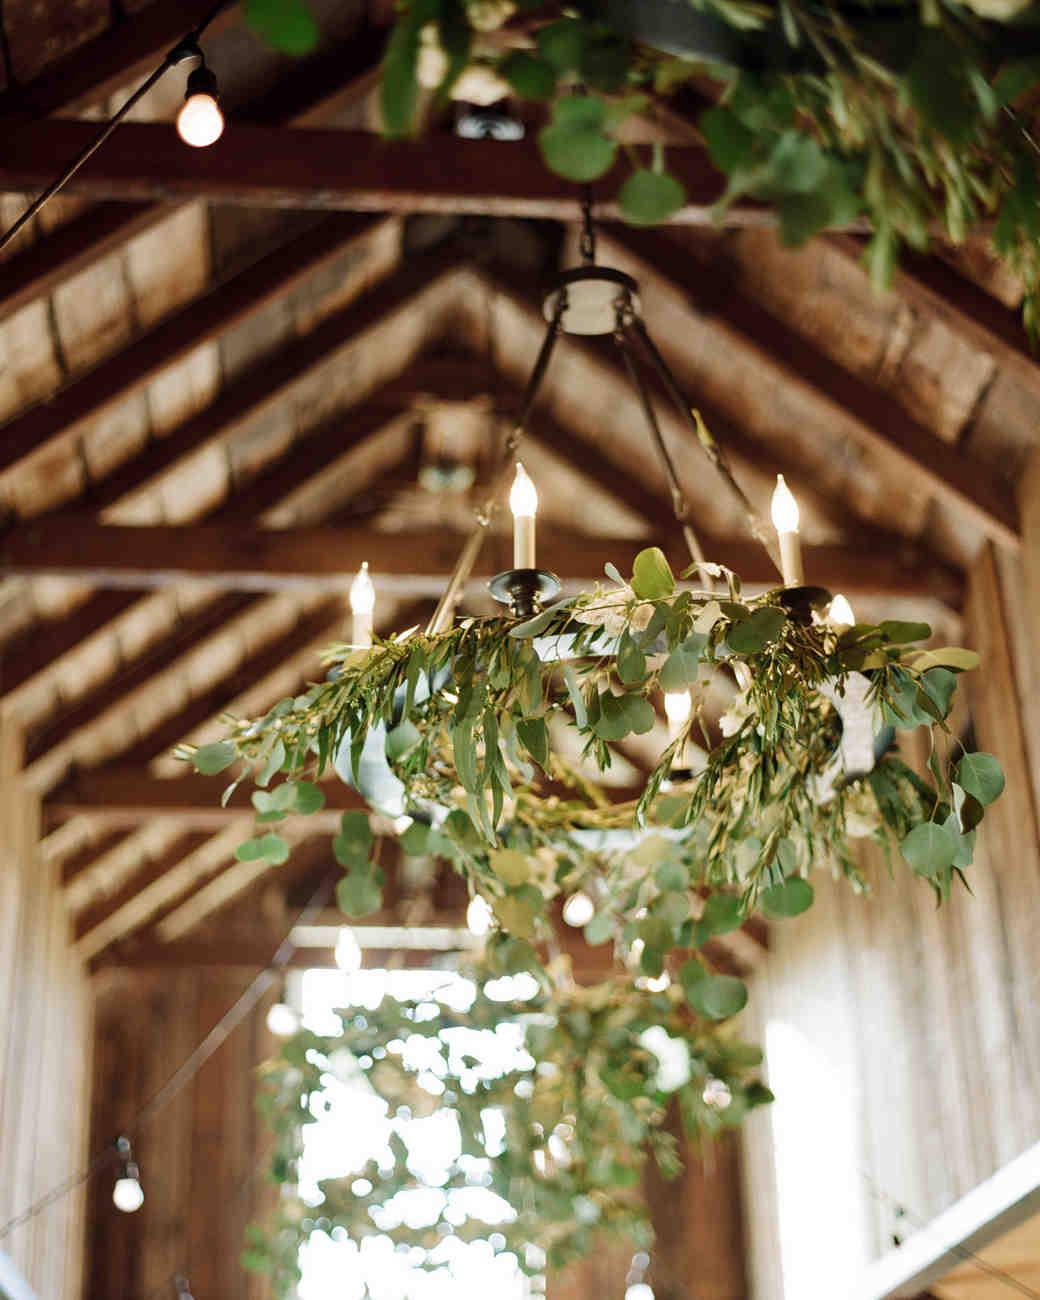 catherine-adrien-wedding-chandelier-0712-s111414-0814.jpg